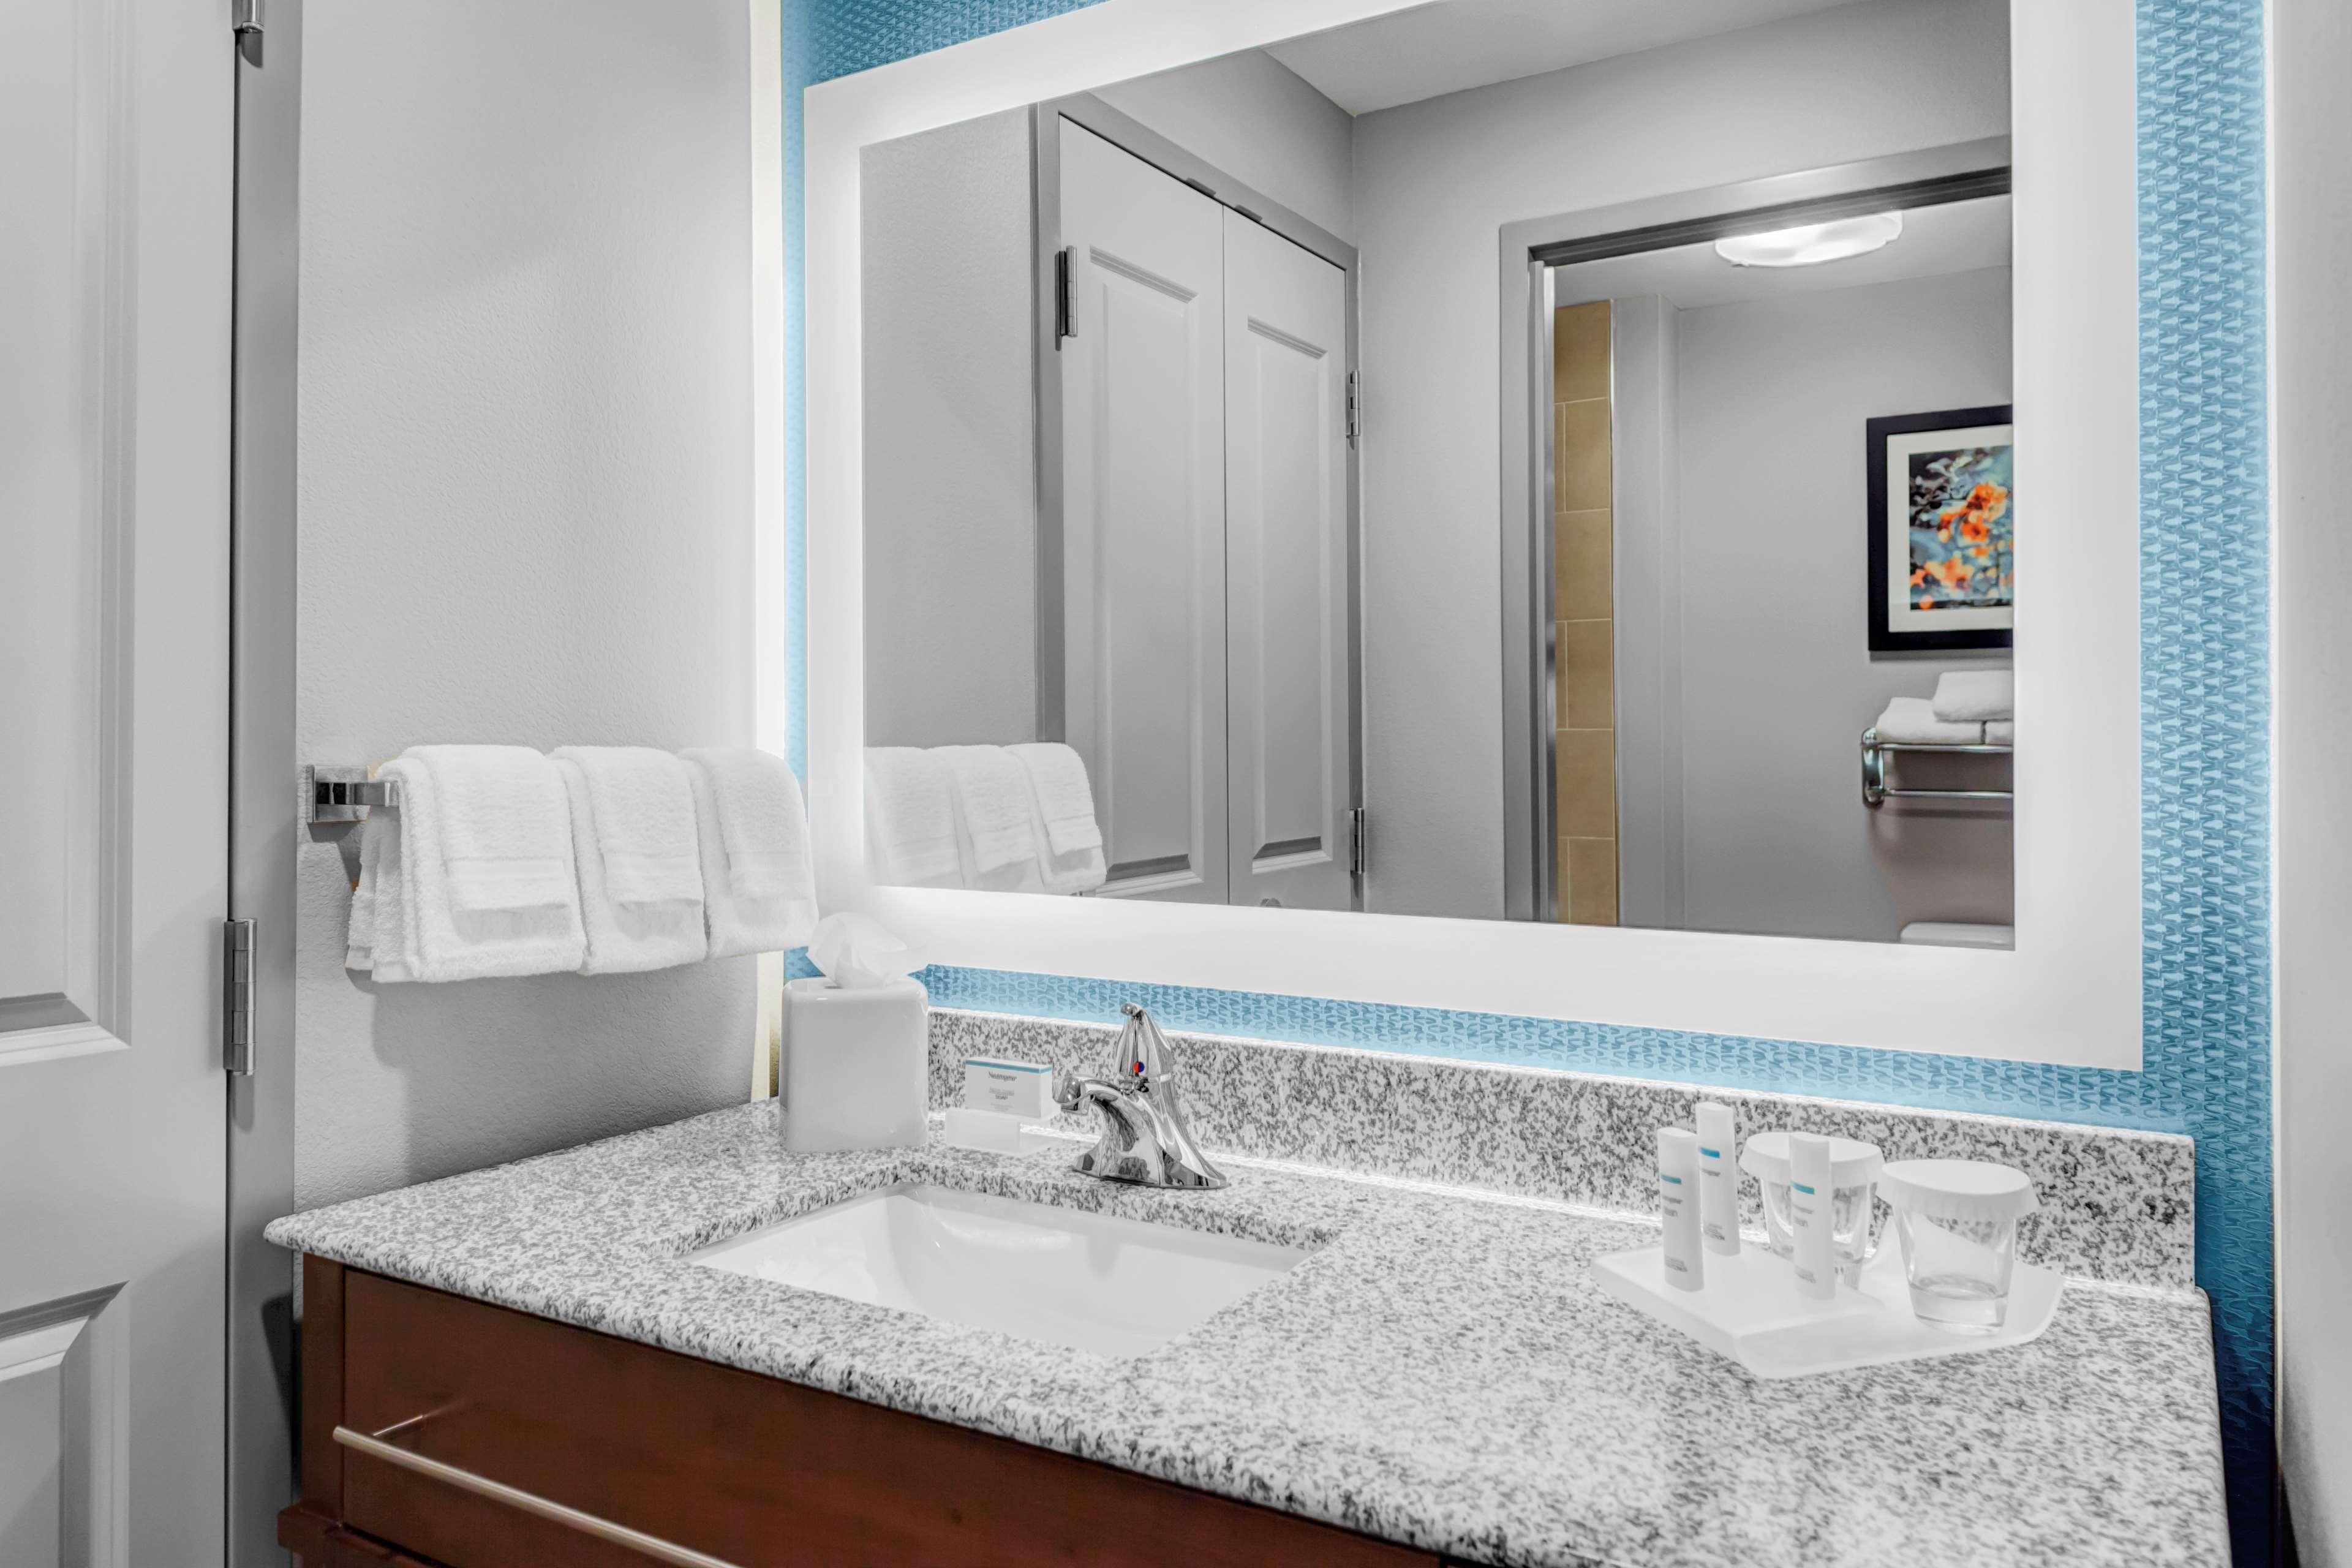 Homewood Suites by Hilton Wauwatosa Milwaukee image 19